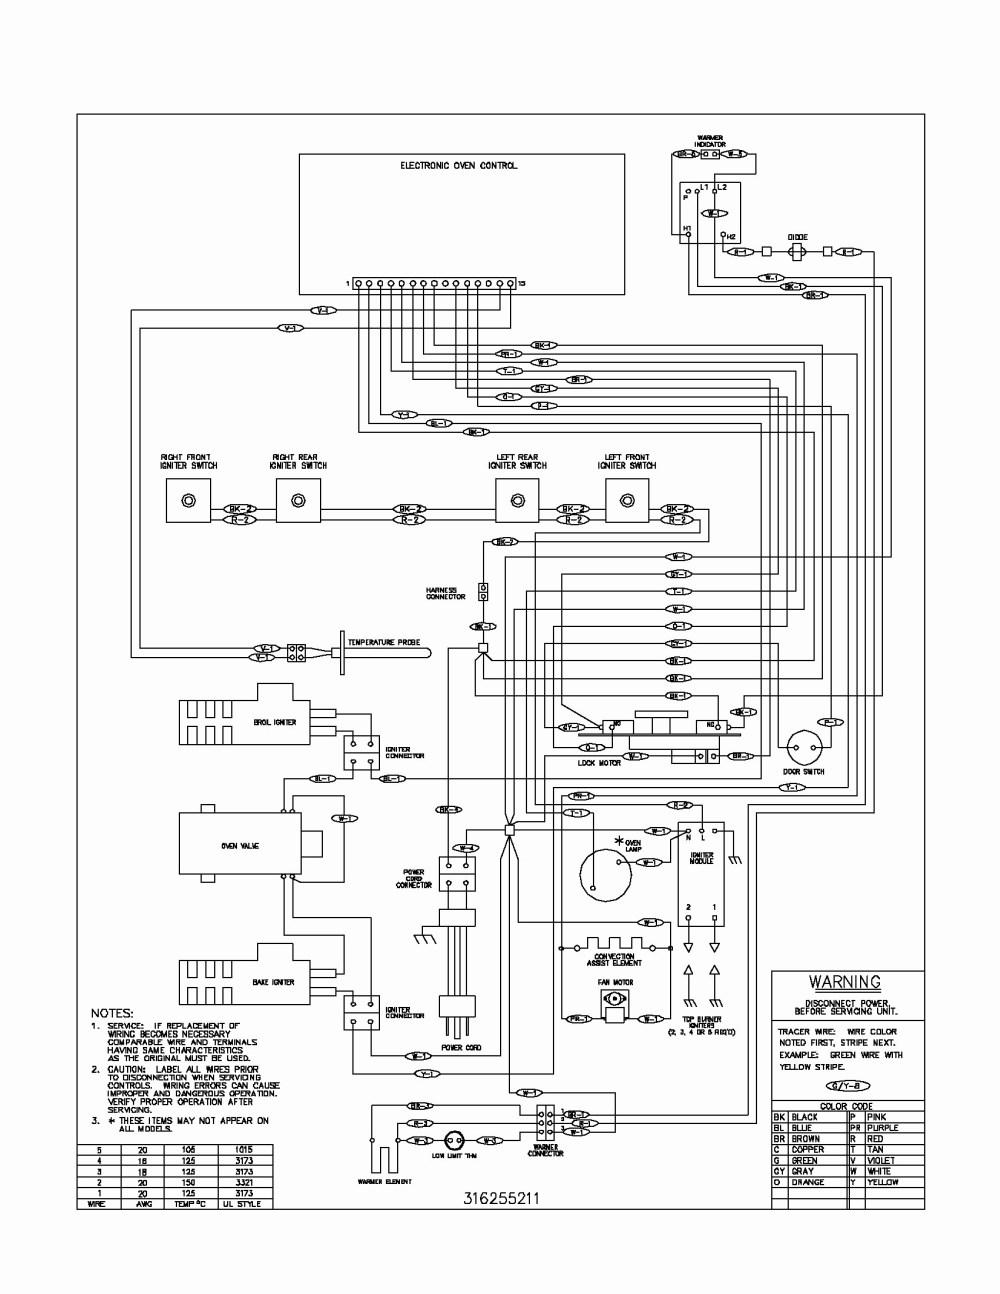 medium resolution of diagram oven kenmore wiring 363 9378810 wiring librarypowder coating oven wiring diagram 14